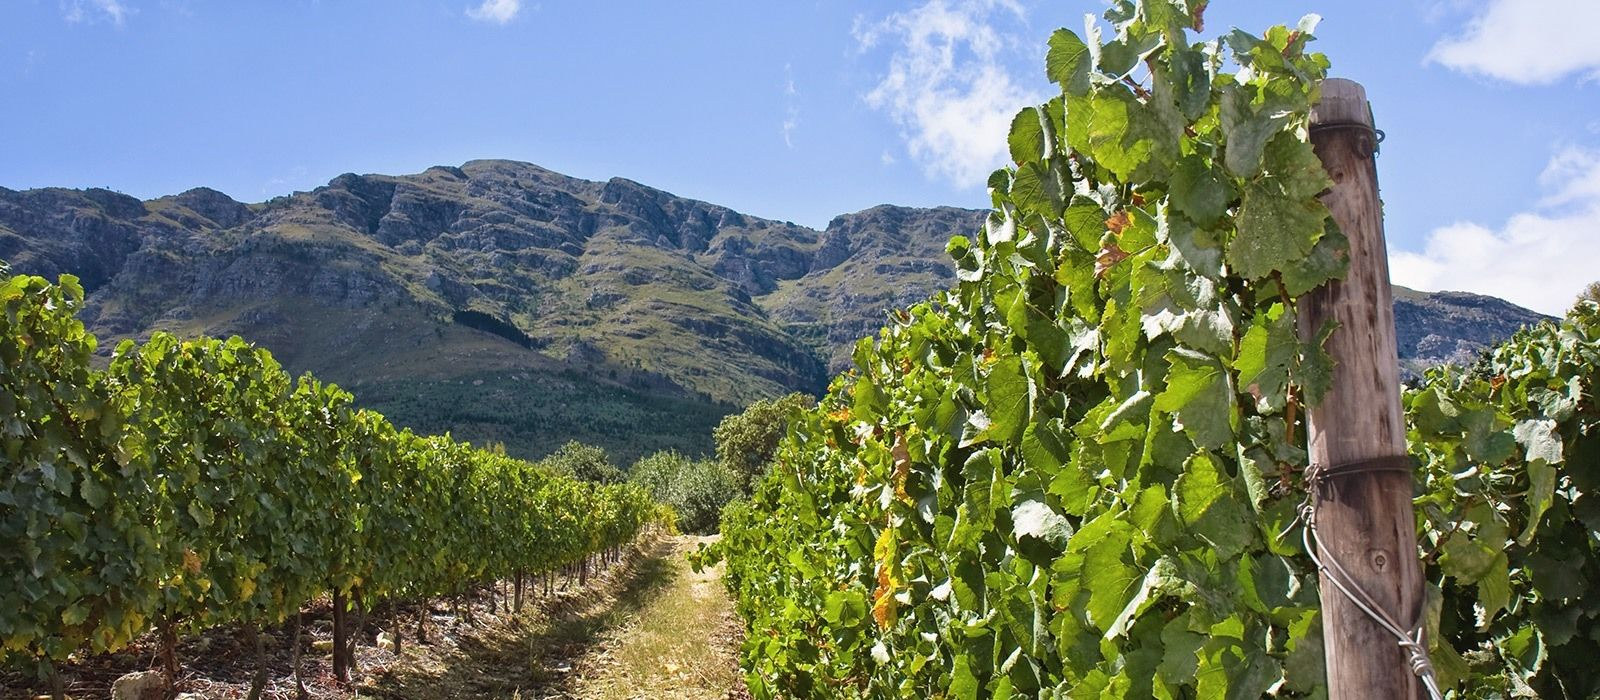 Südafrika, Sambia & Botswana: Safaris, Wein und Wasserfälle Urlaub 6